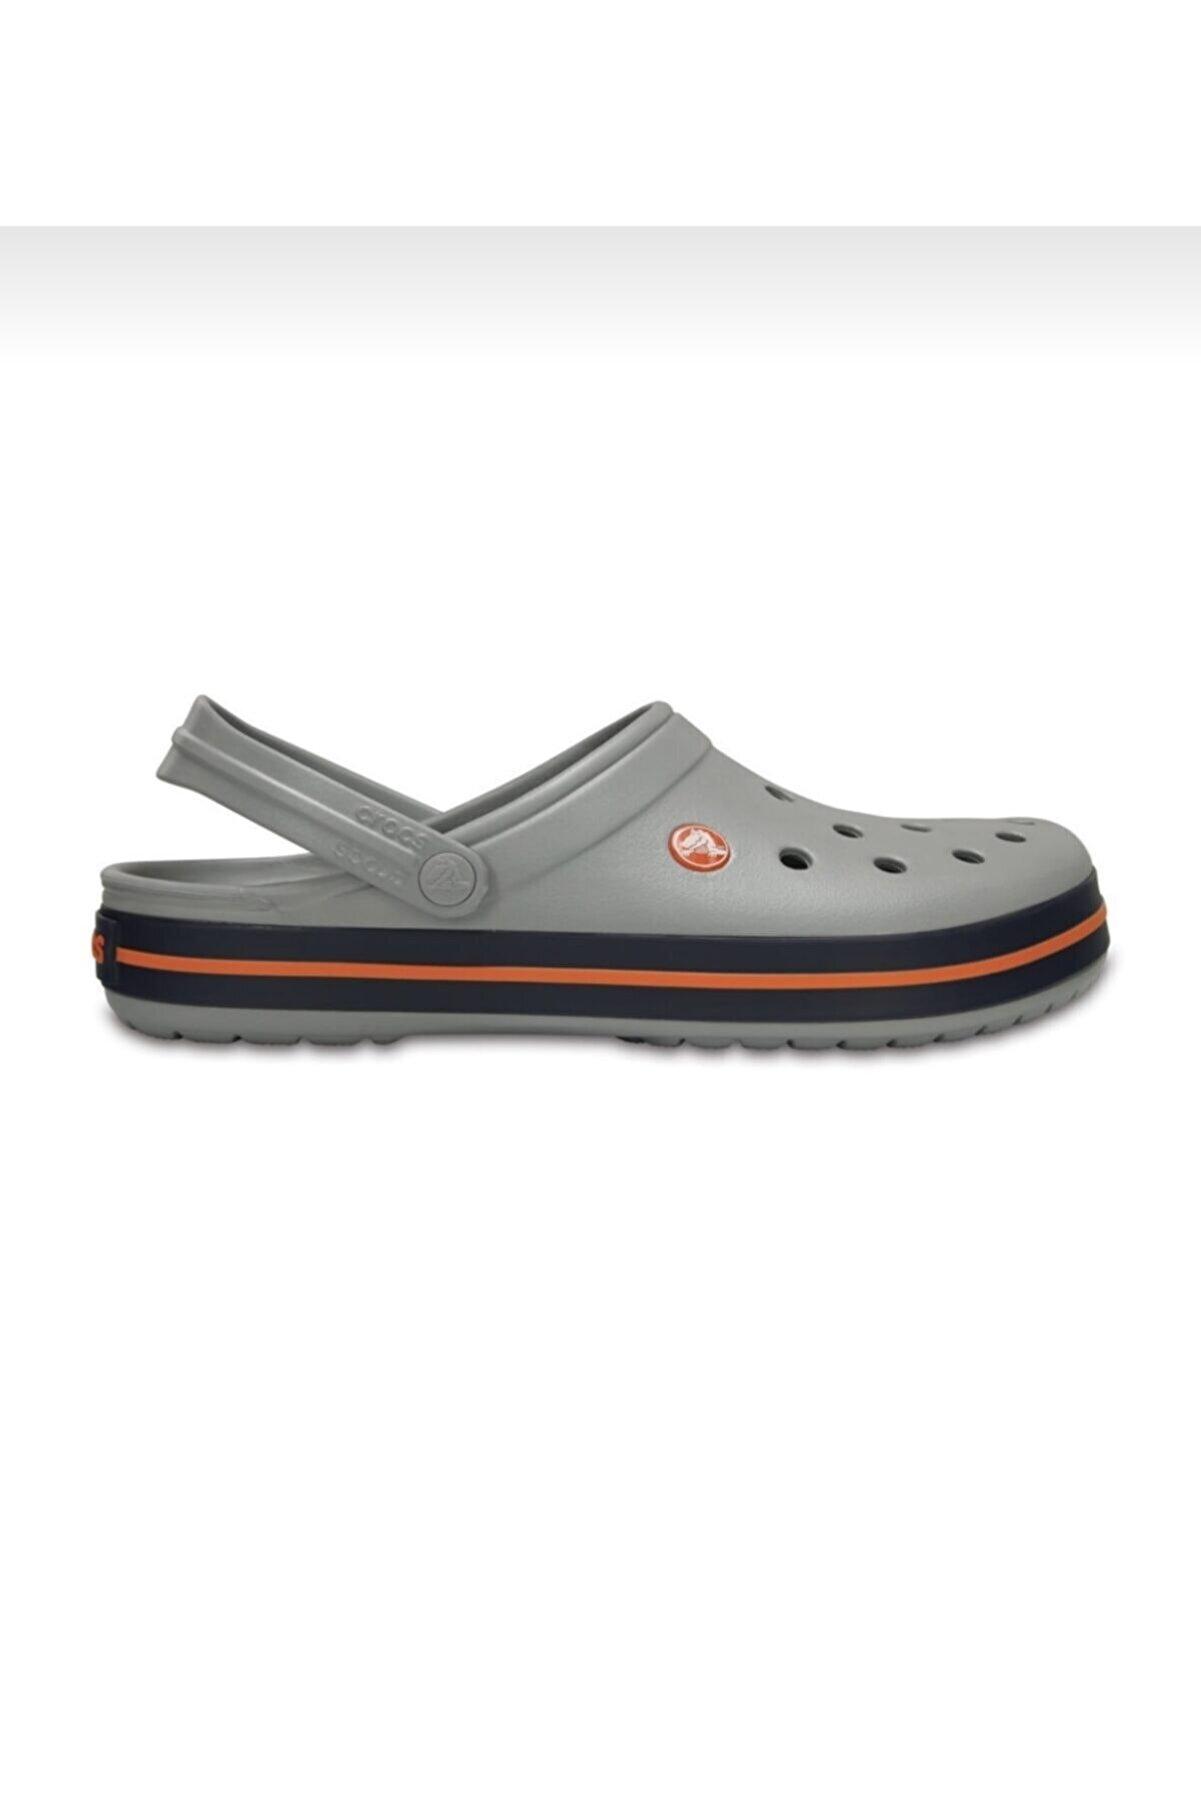 Crocs Gri Laci Crocband Terlik 11016